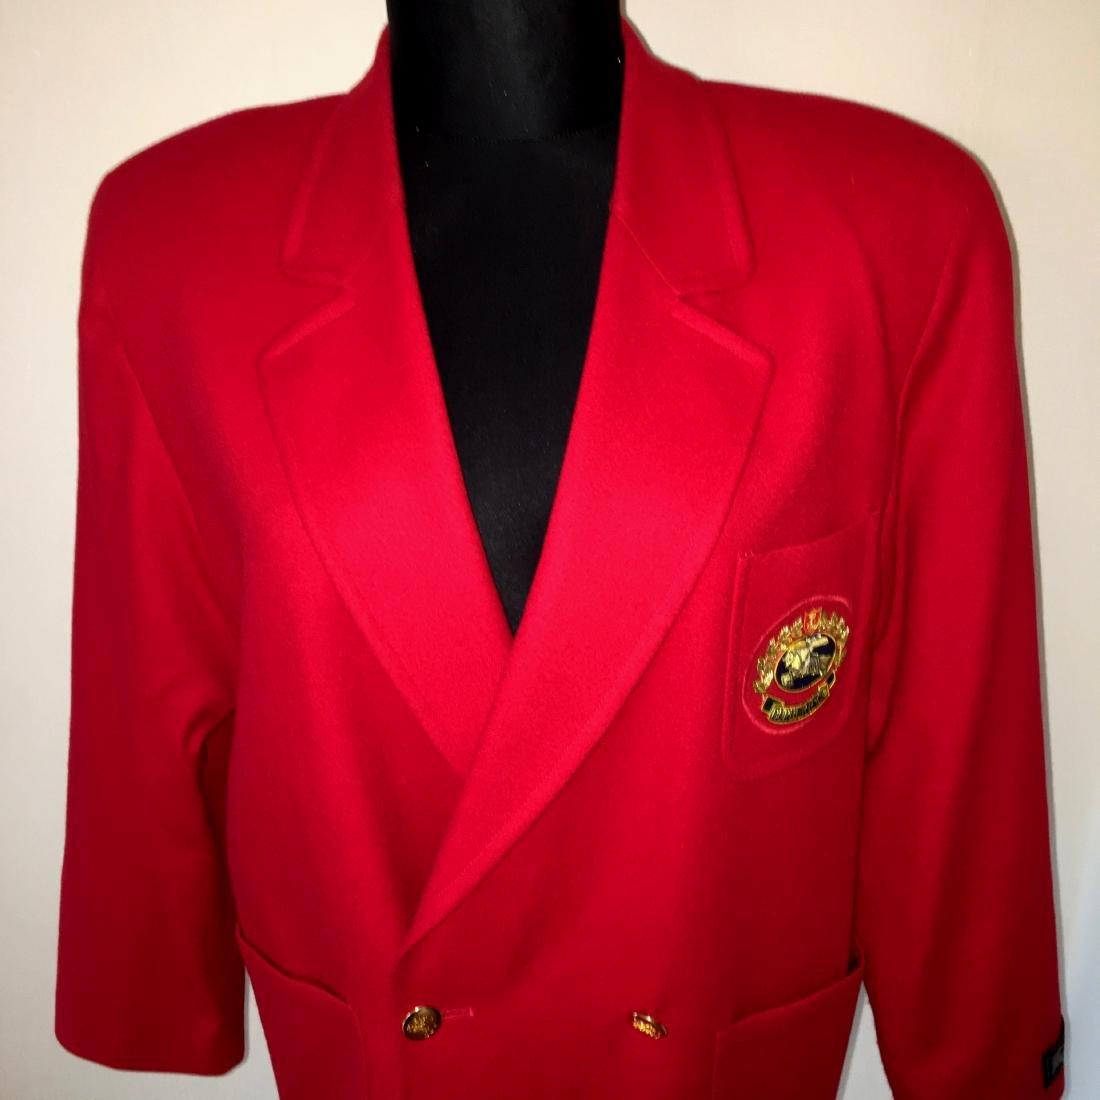 Women's Burberry Vintage 100% Wool Red Jacket Blazer - 4